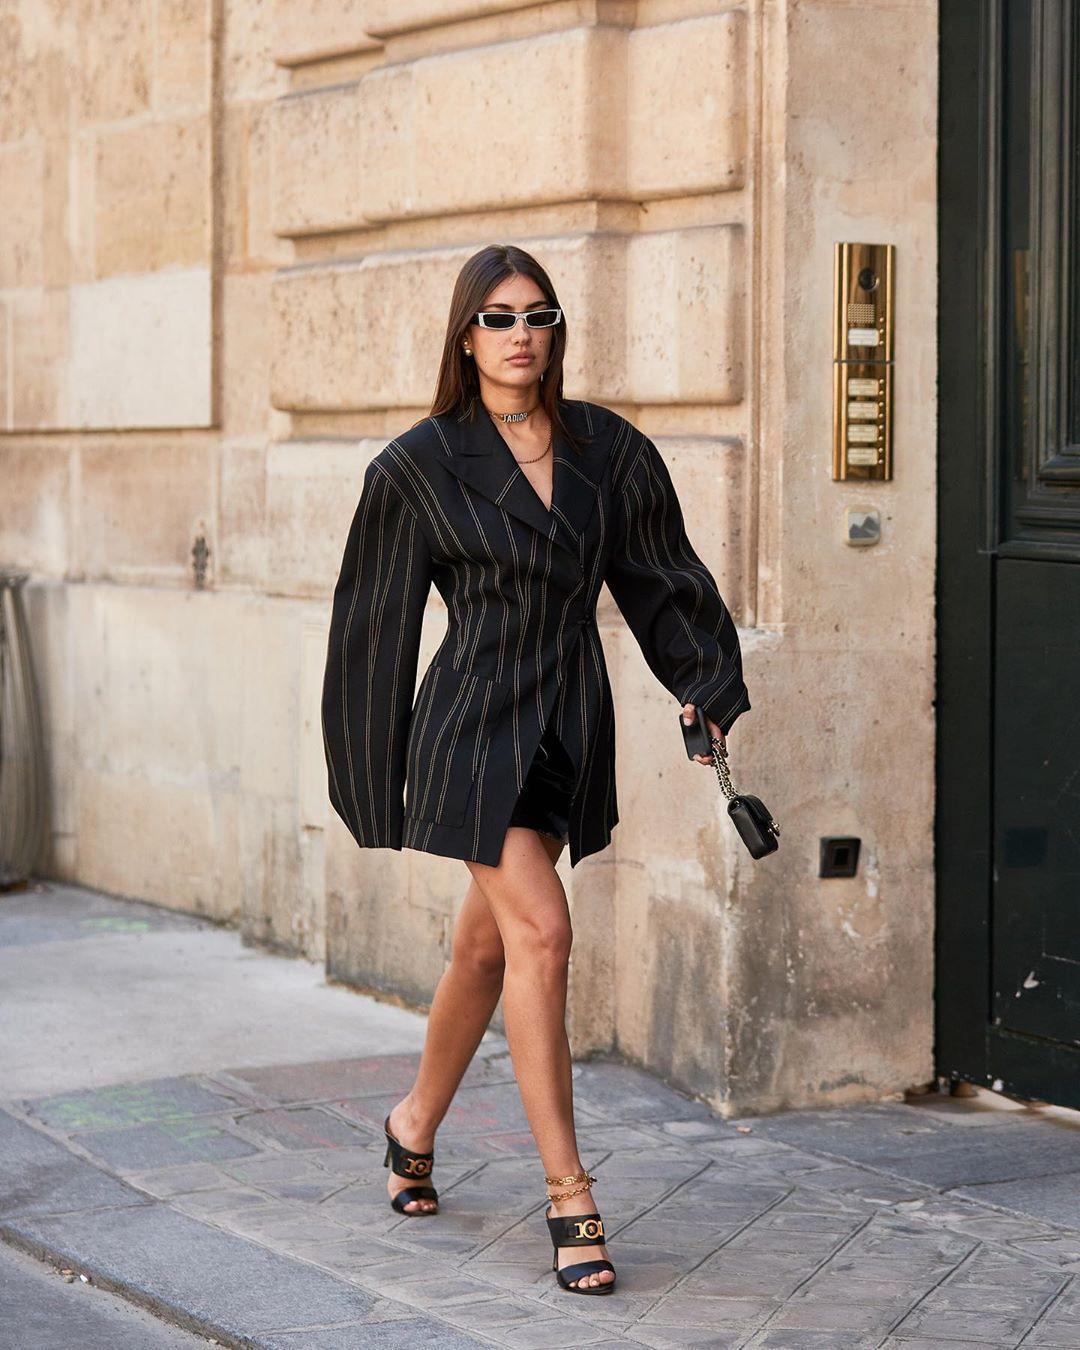 shoes black sandals oversized stripes black blazer versace mini skirt black skirt black bag